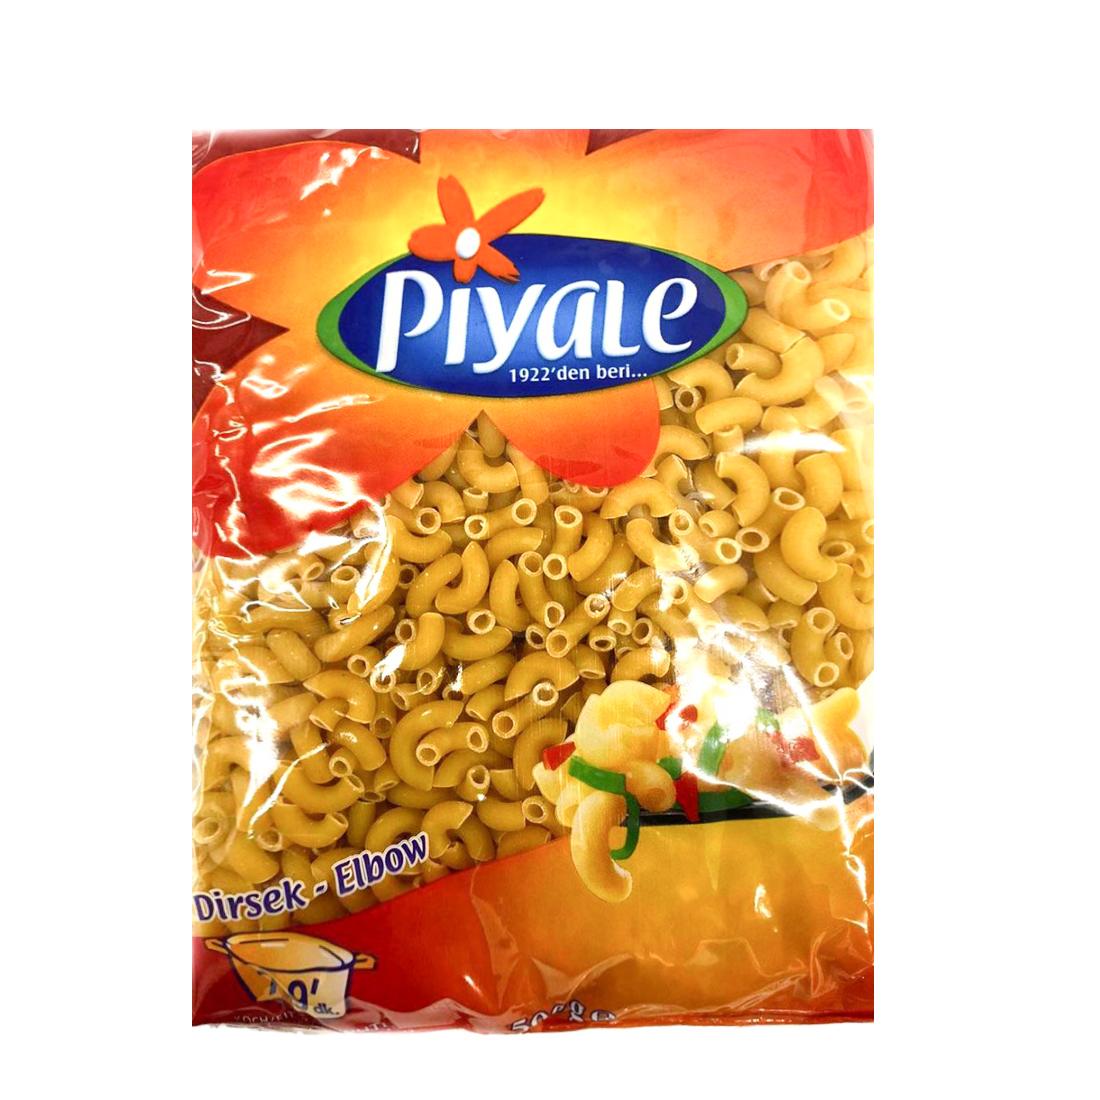 Piyale Dirsek / Mini Hörnchennudeln 500g